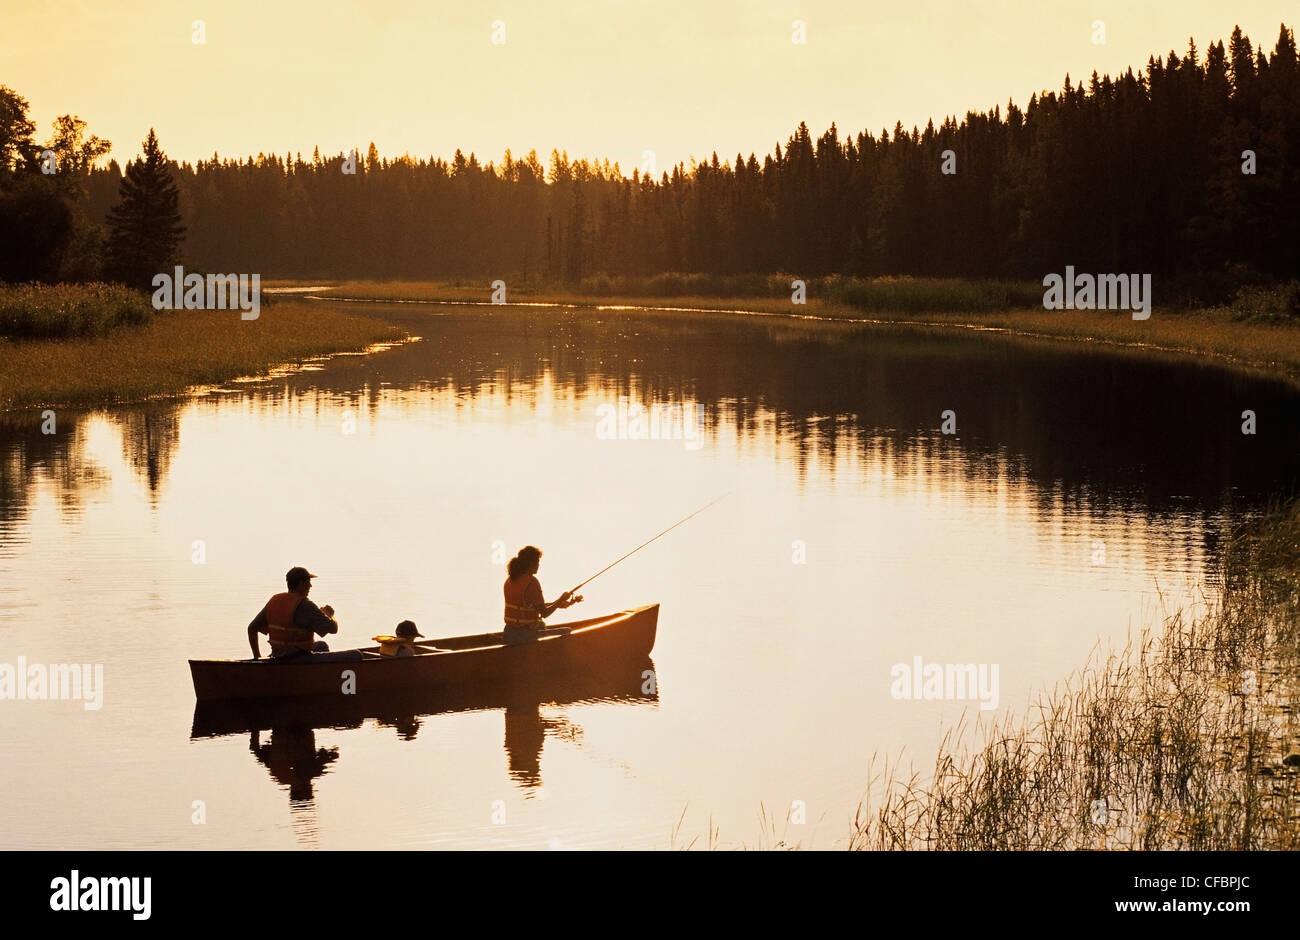 Family canoeing and fishing, Whiteshell River, Whiteshell Provincial Park, Manitoba, Canada - Stock Image